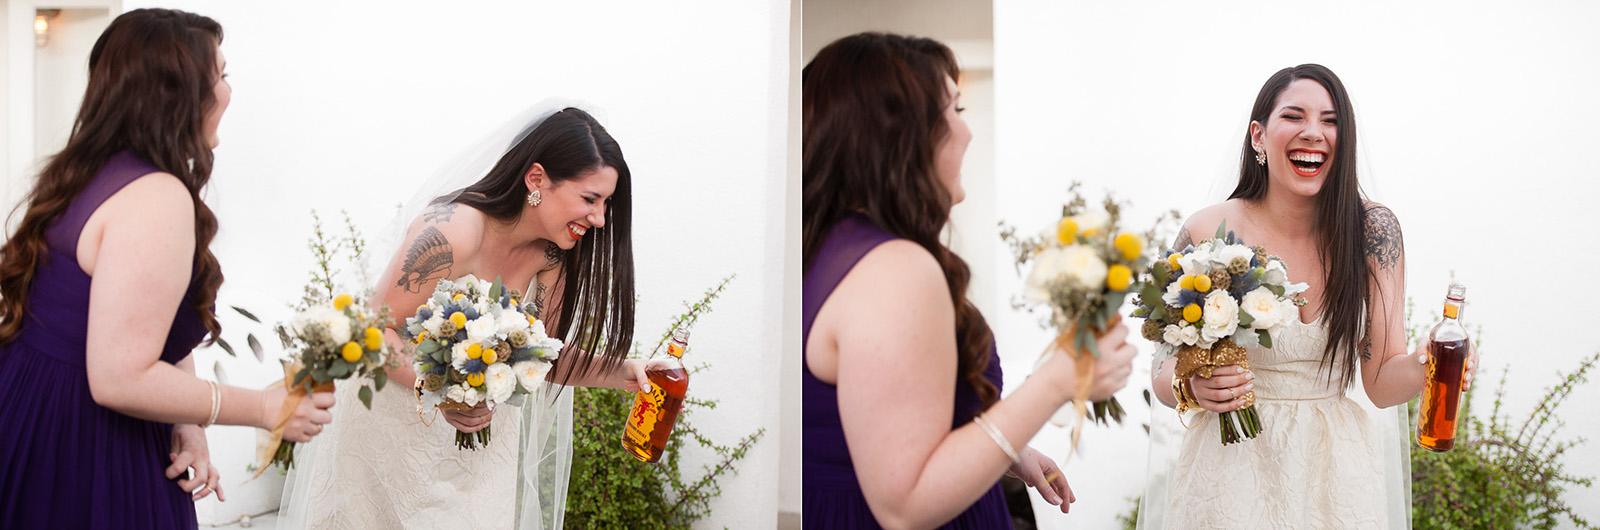 ace-hotel-palm-springs-wedding-431.jpg